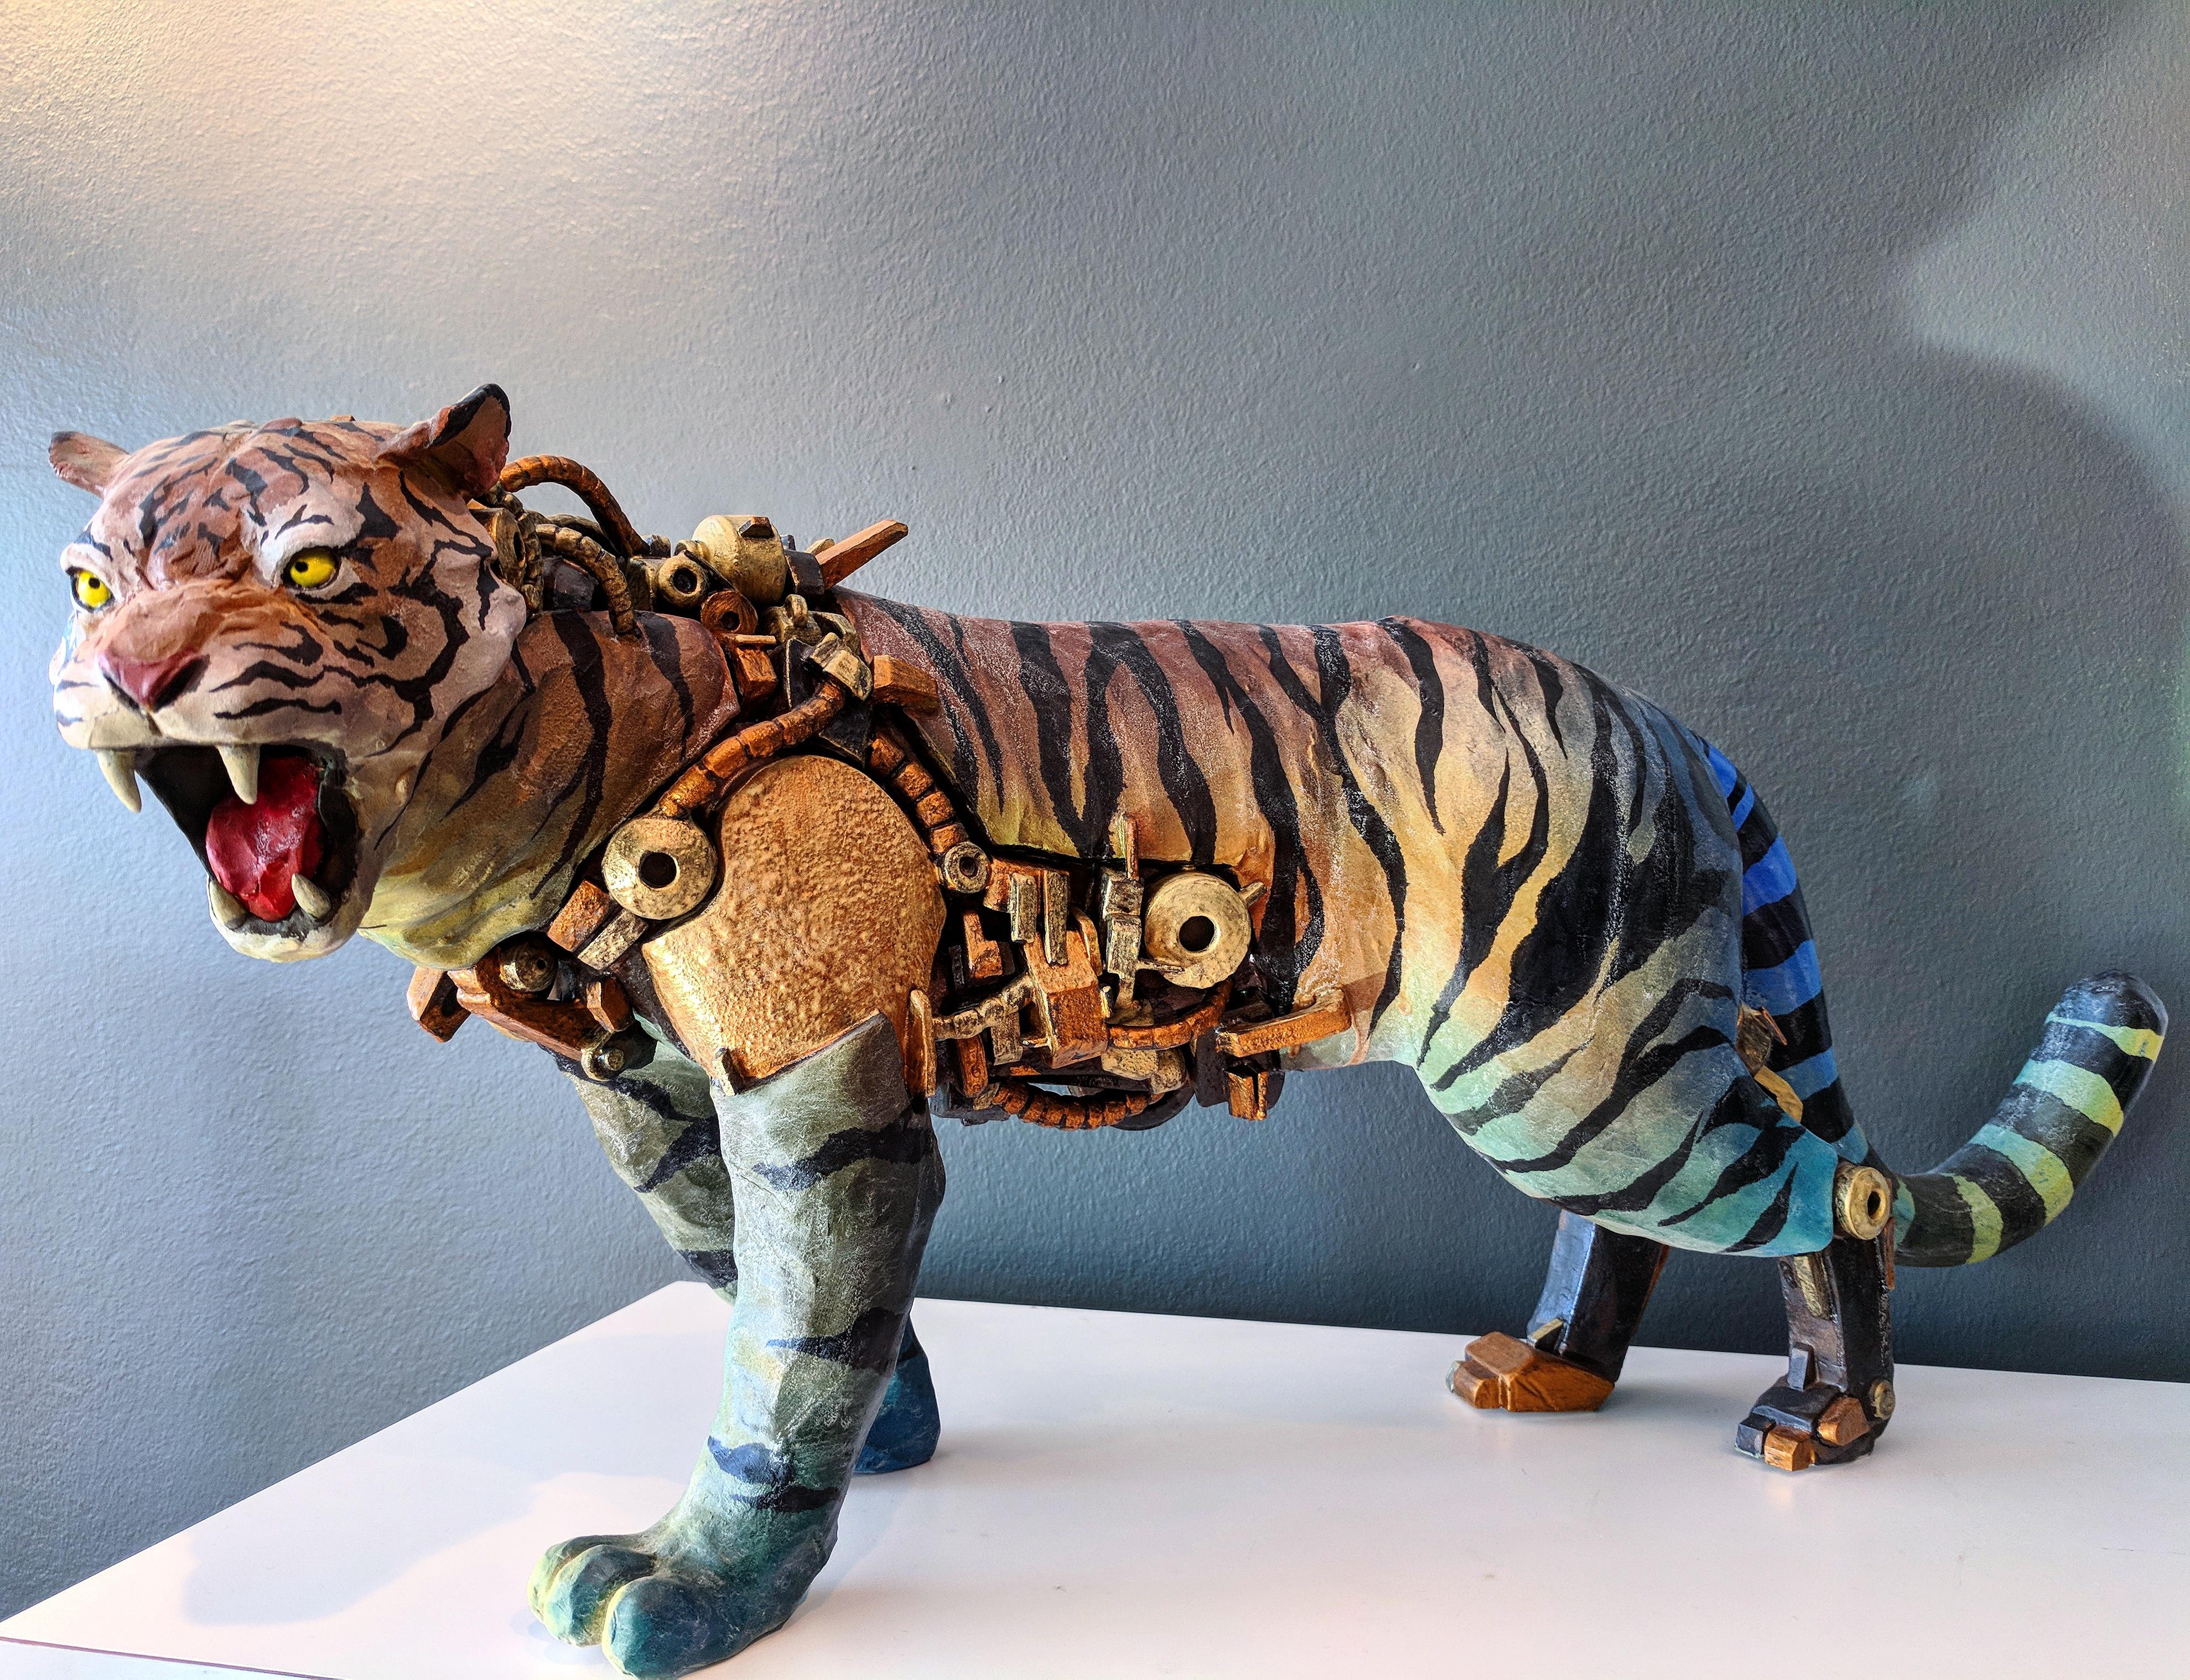 Ceramic sculpture by Joonsang Park